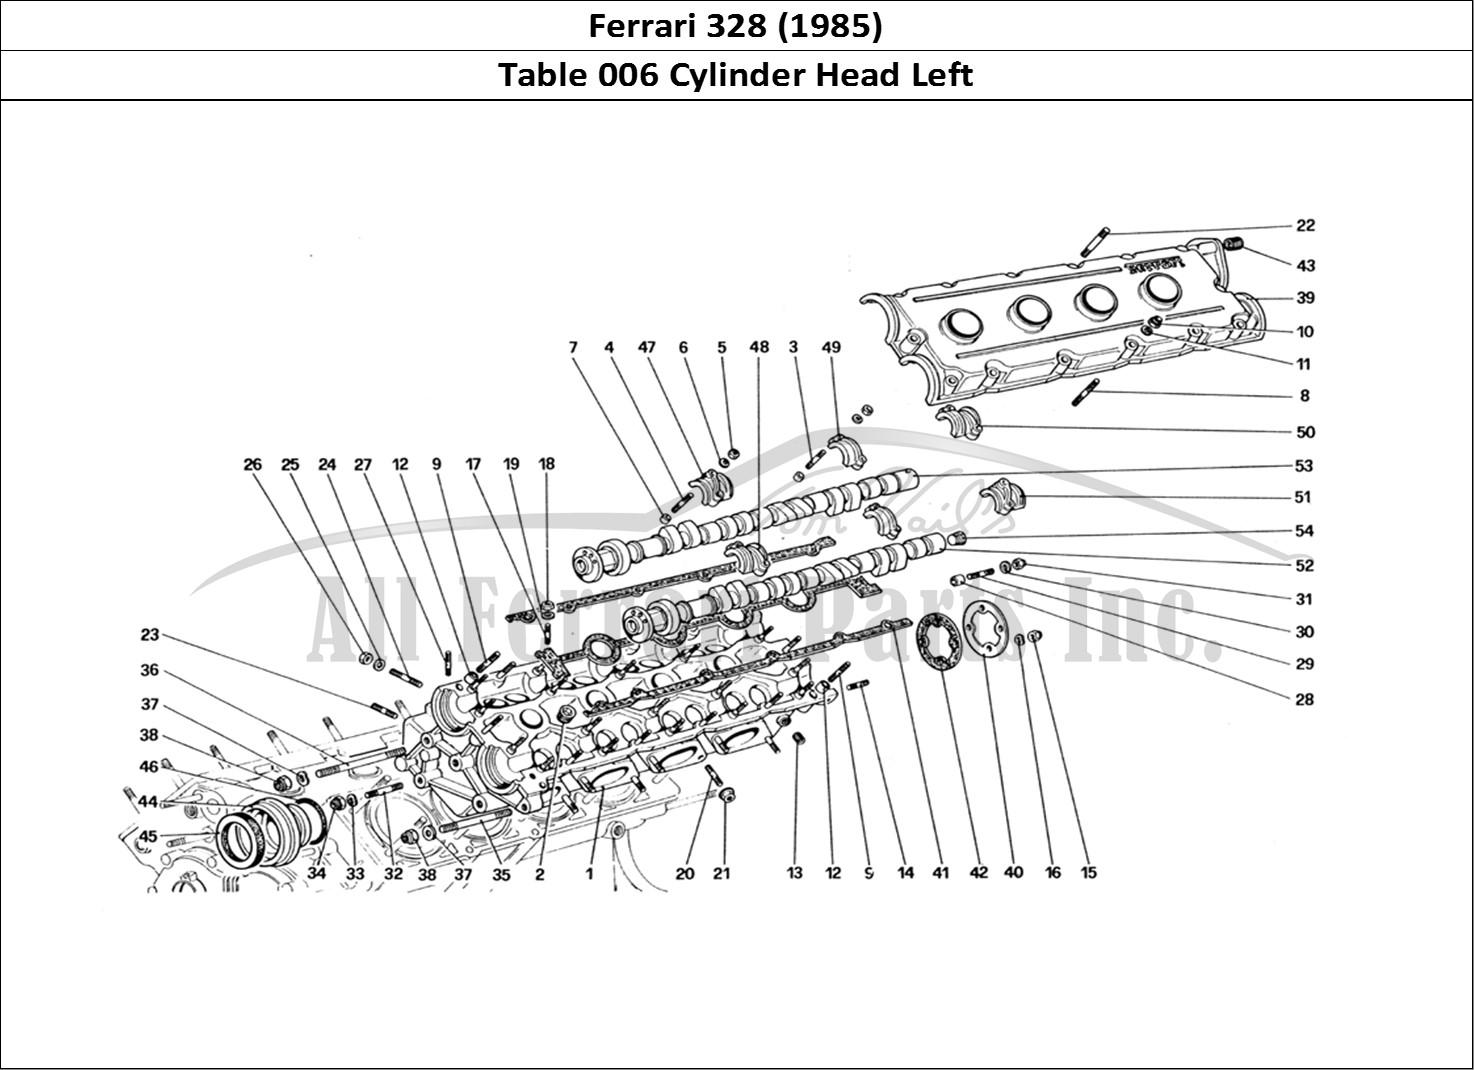 Buy Original Ferrari 328 006 Cylinder Head Left Ferrari Parts Spares Accessories Online